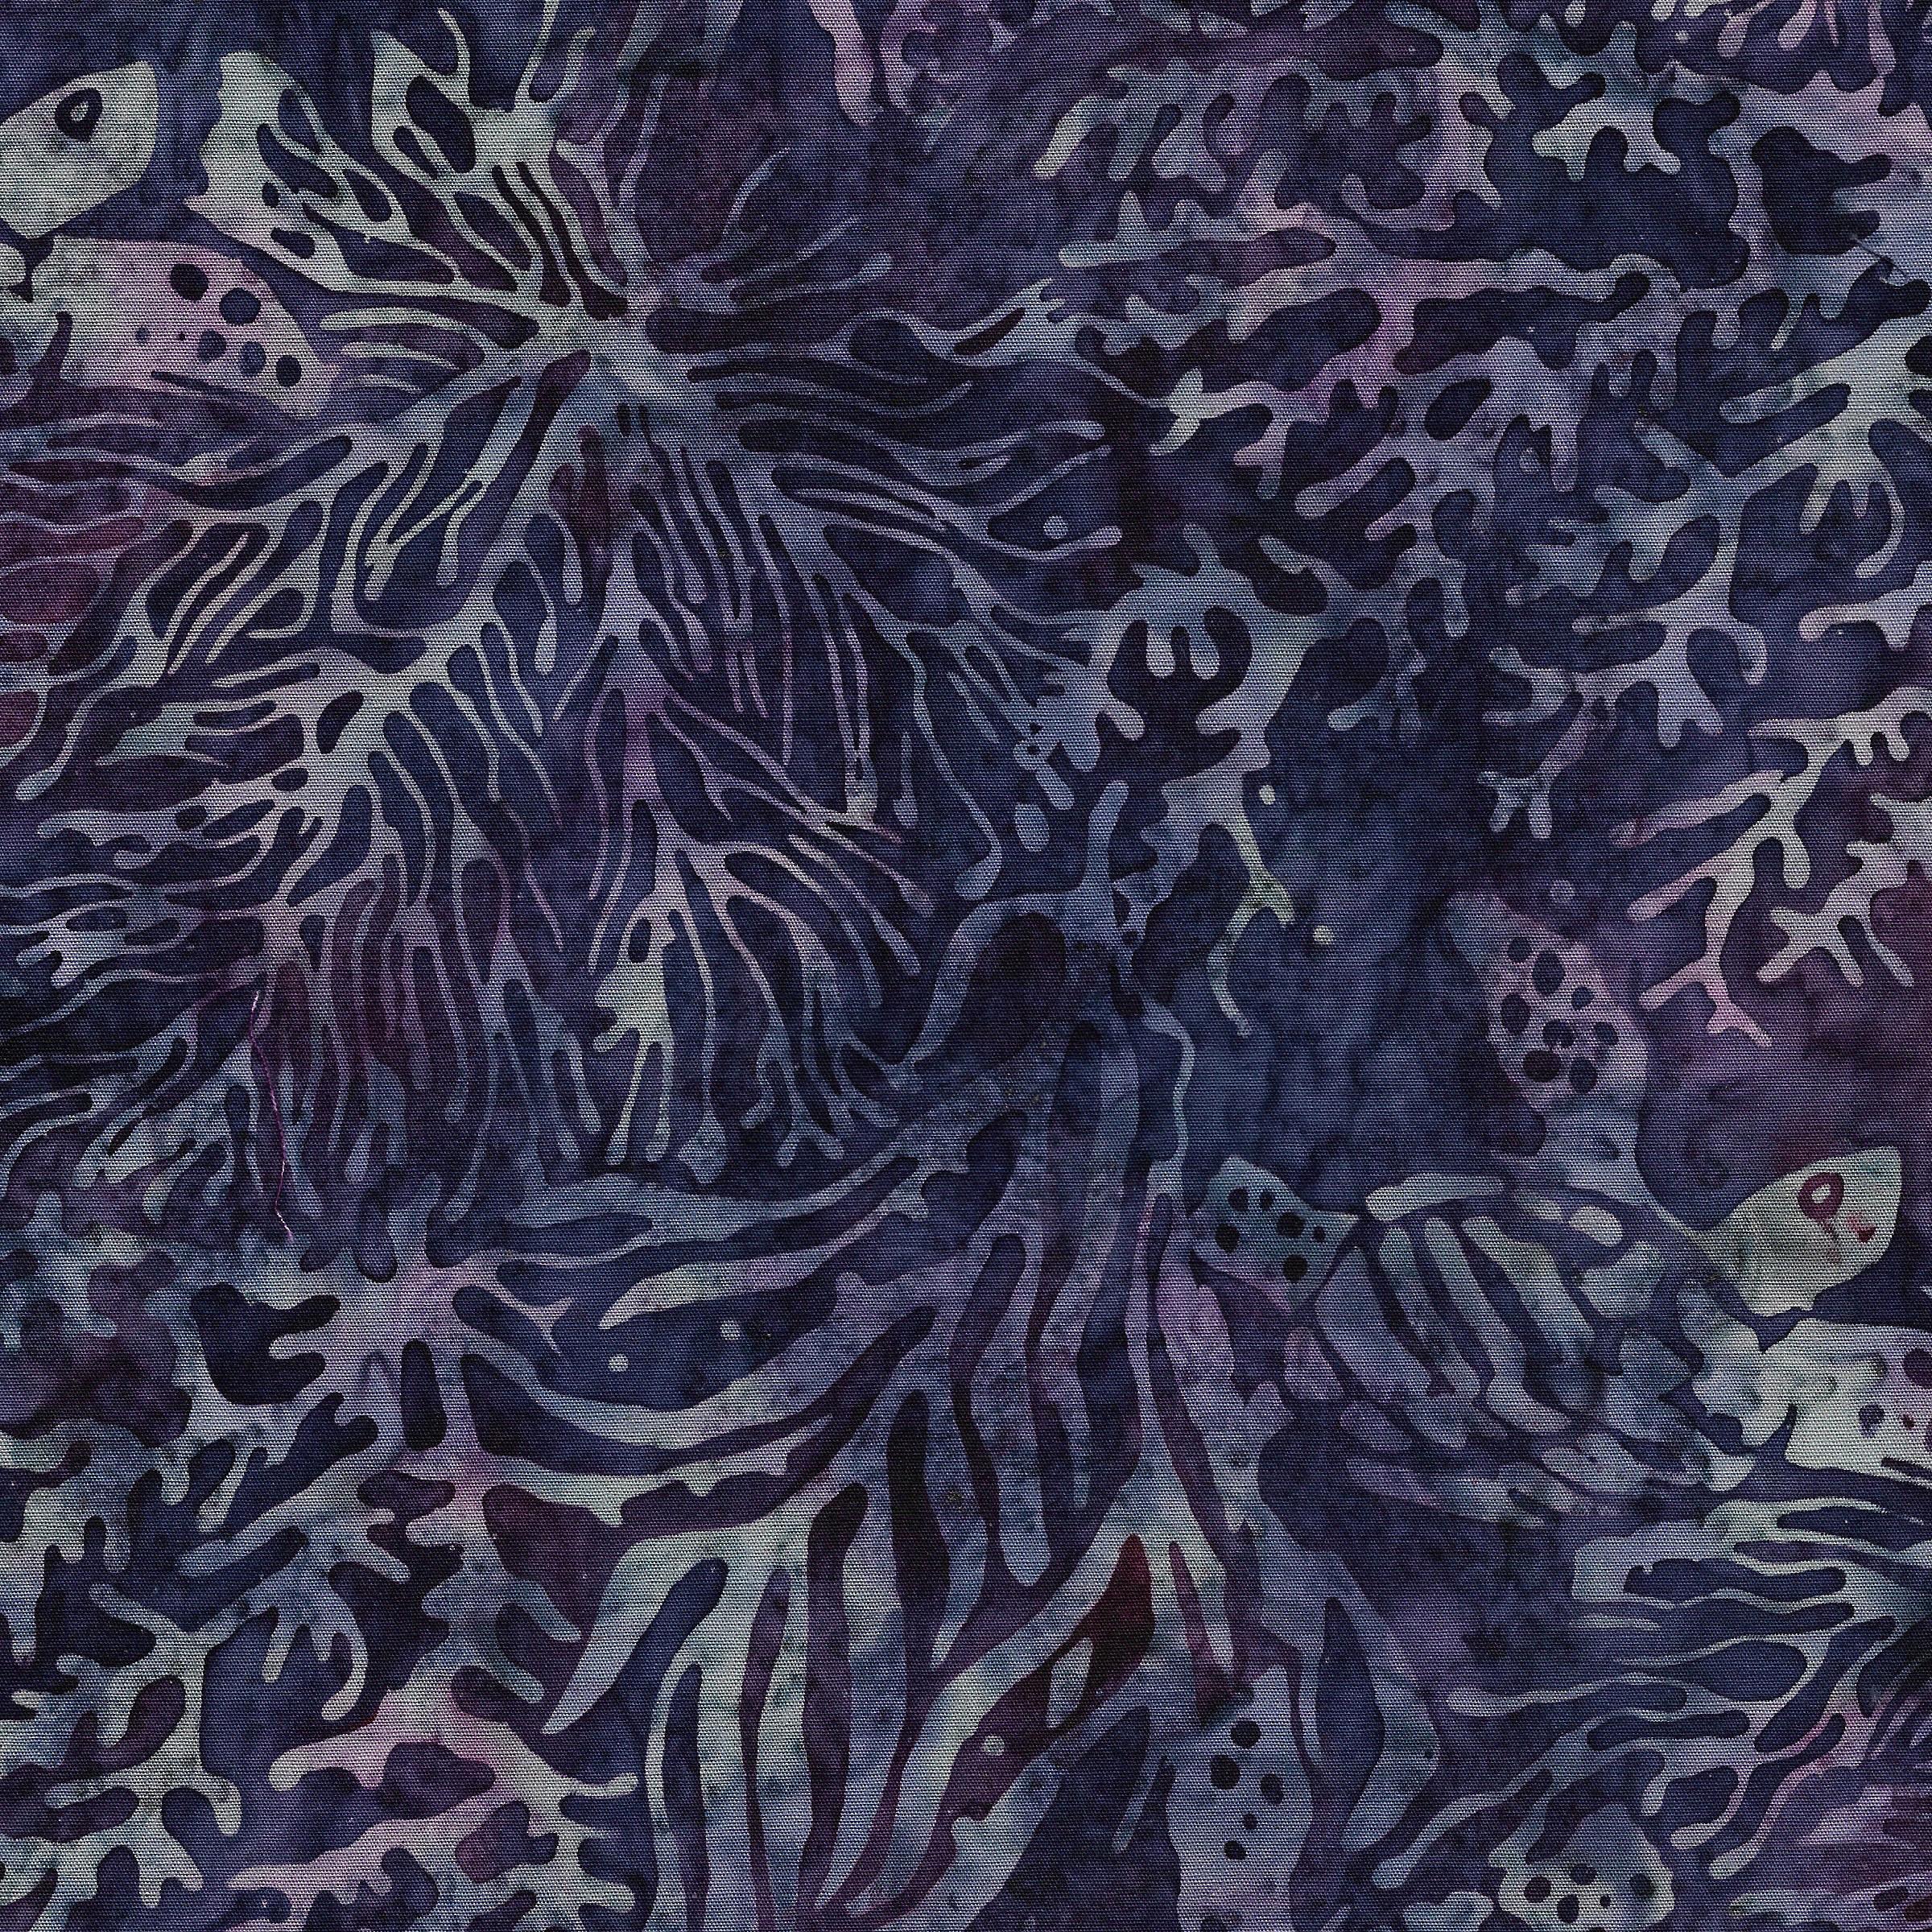 Island Batik - 111903470 / Turtles -Blurple